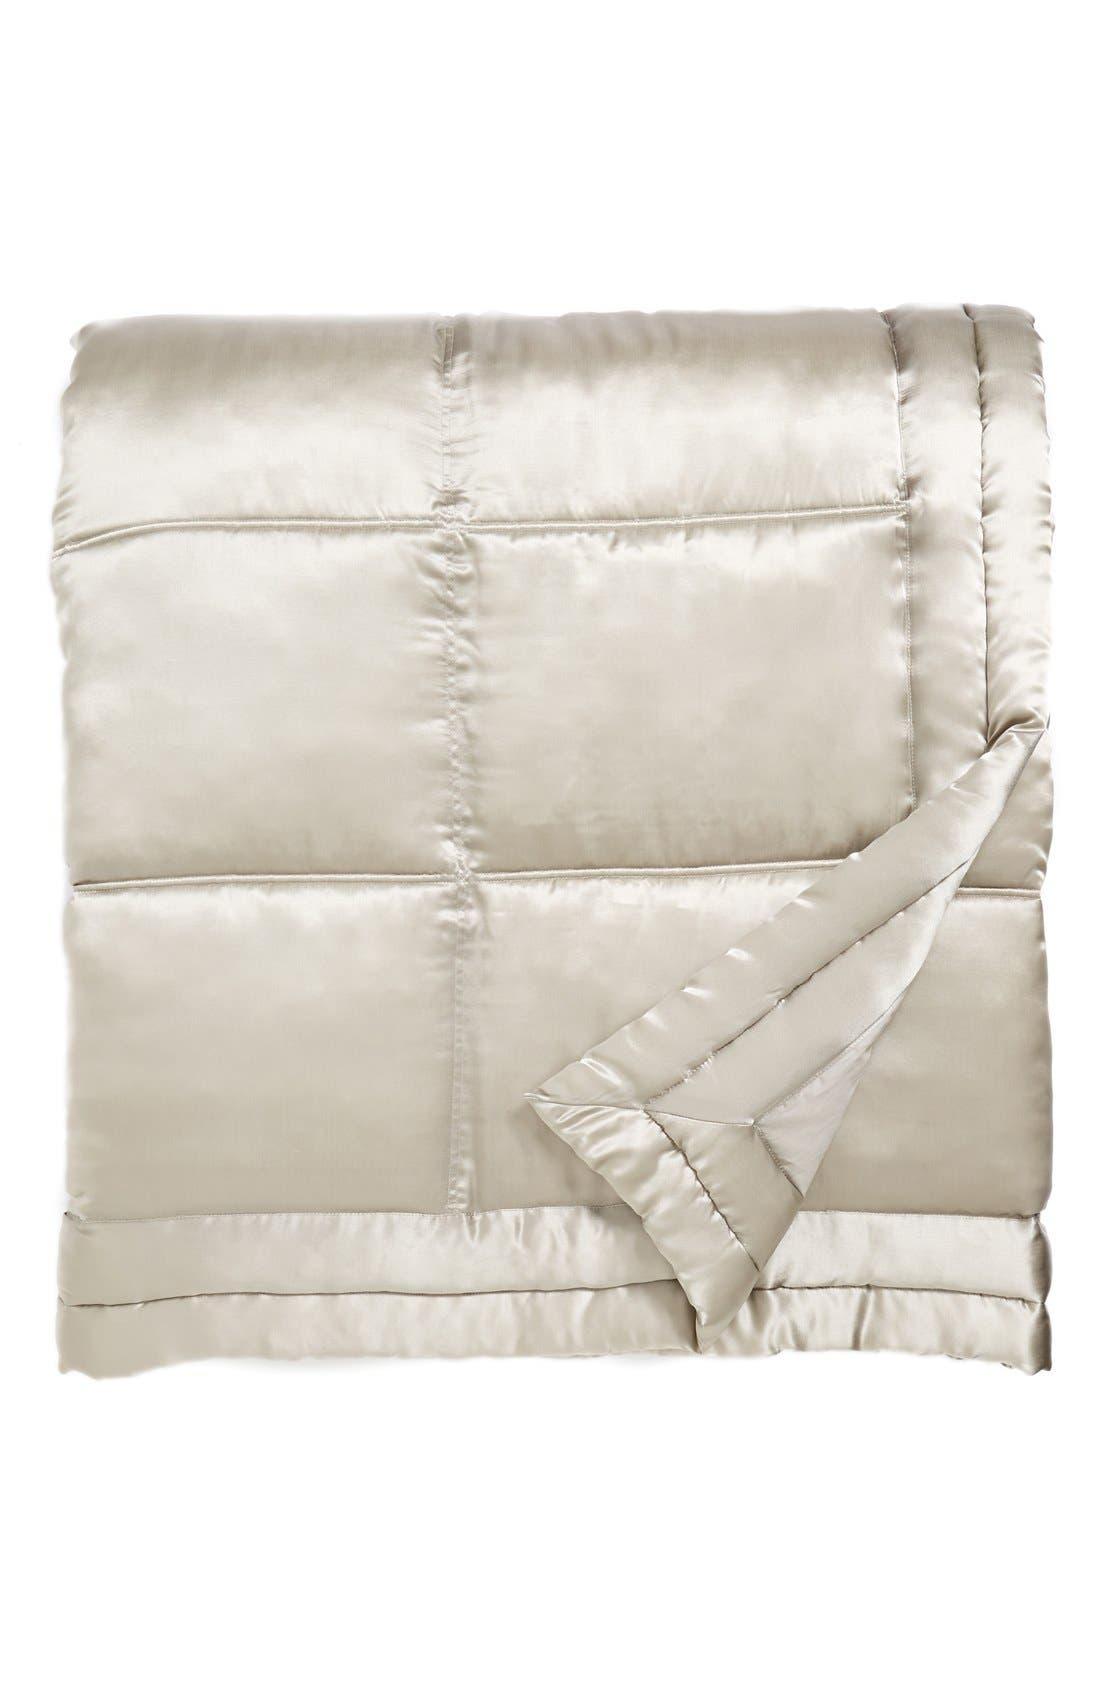 Donna Karan Collection 'Reflection' Silk Charmeuse Quilt,                             Main thumbnail 1, color,                             040